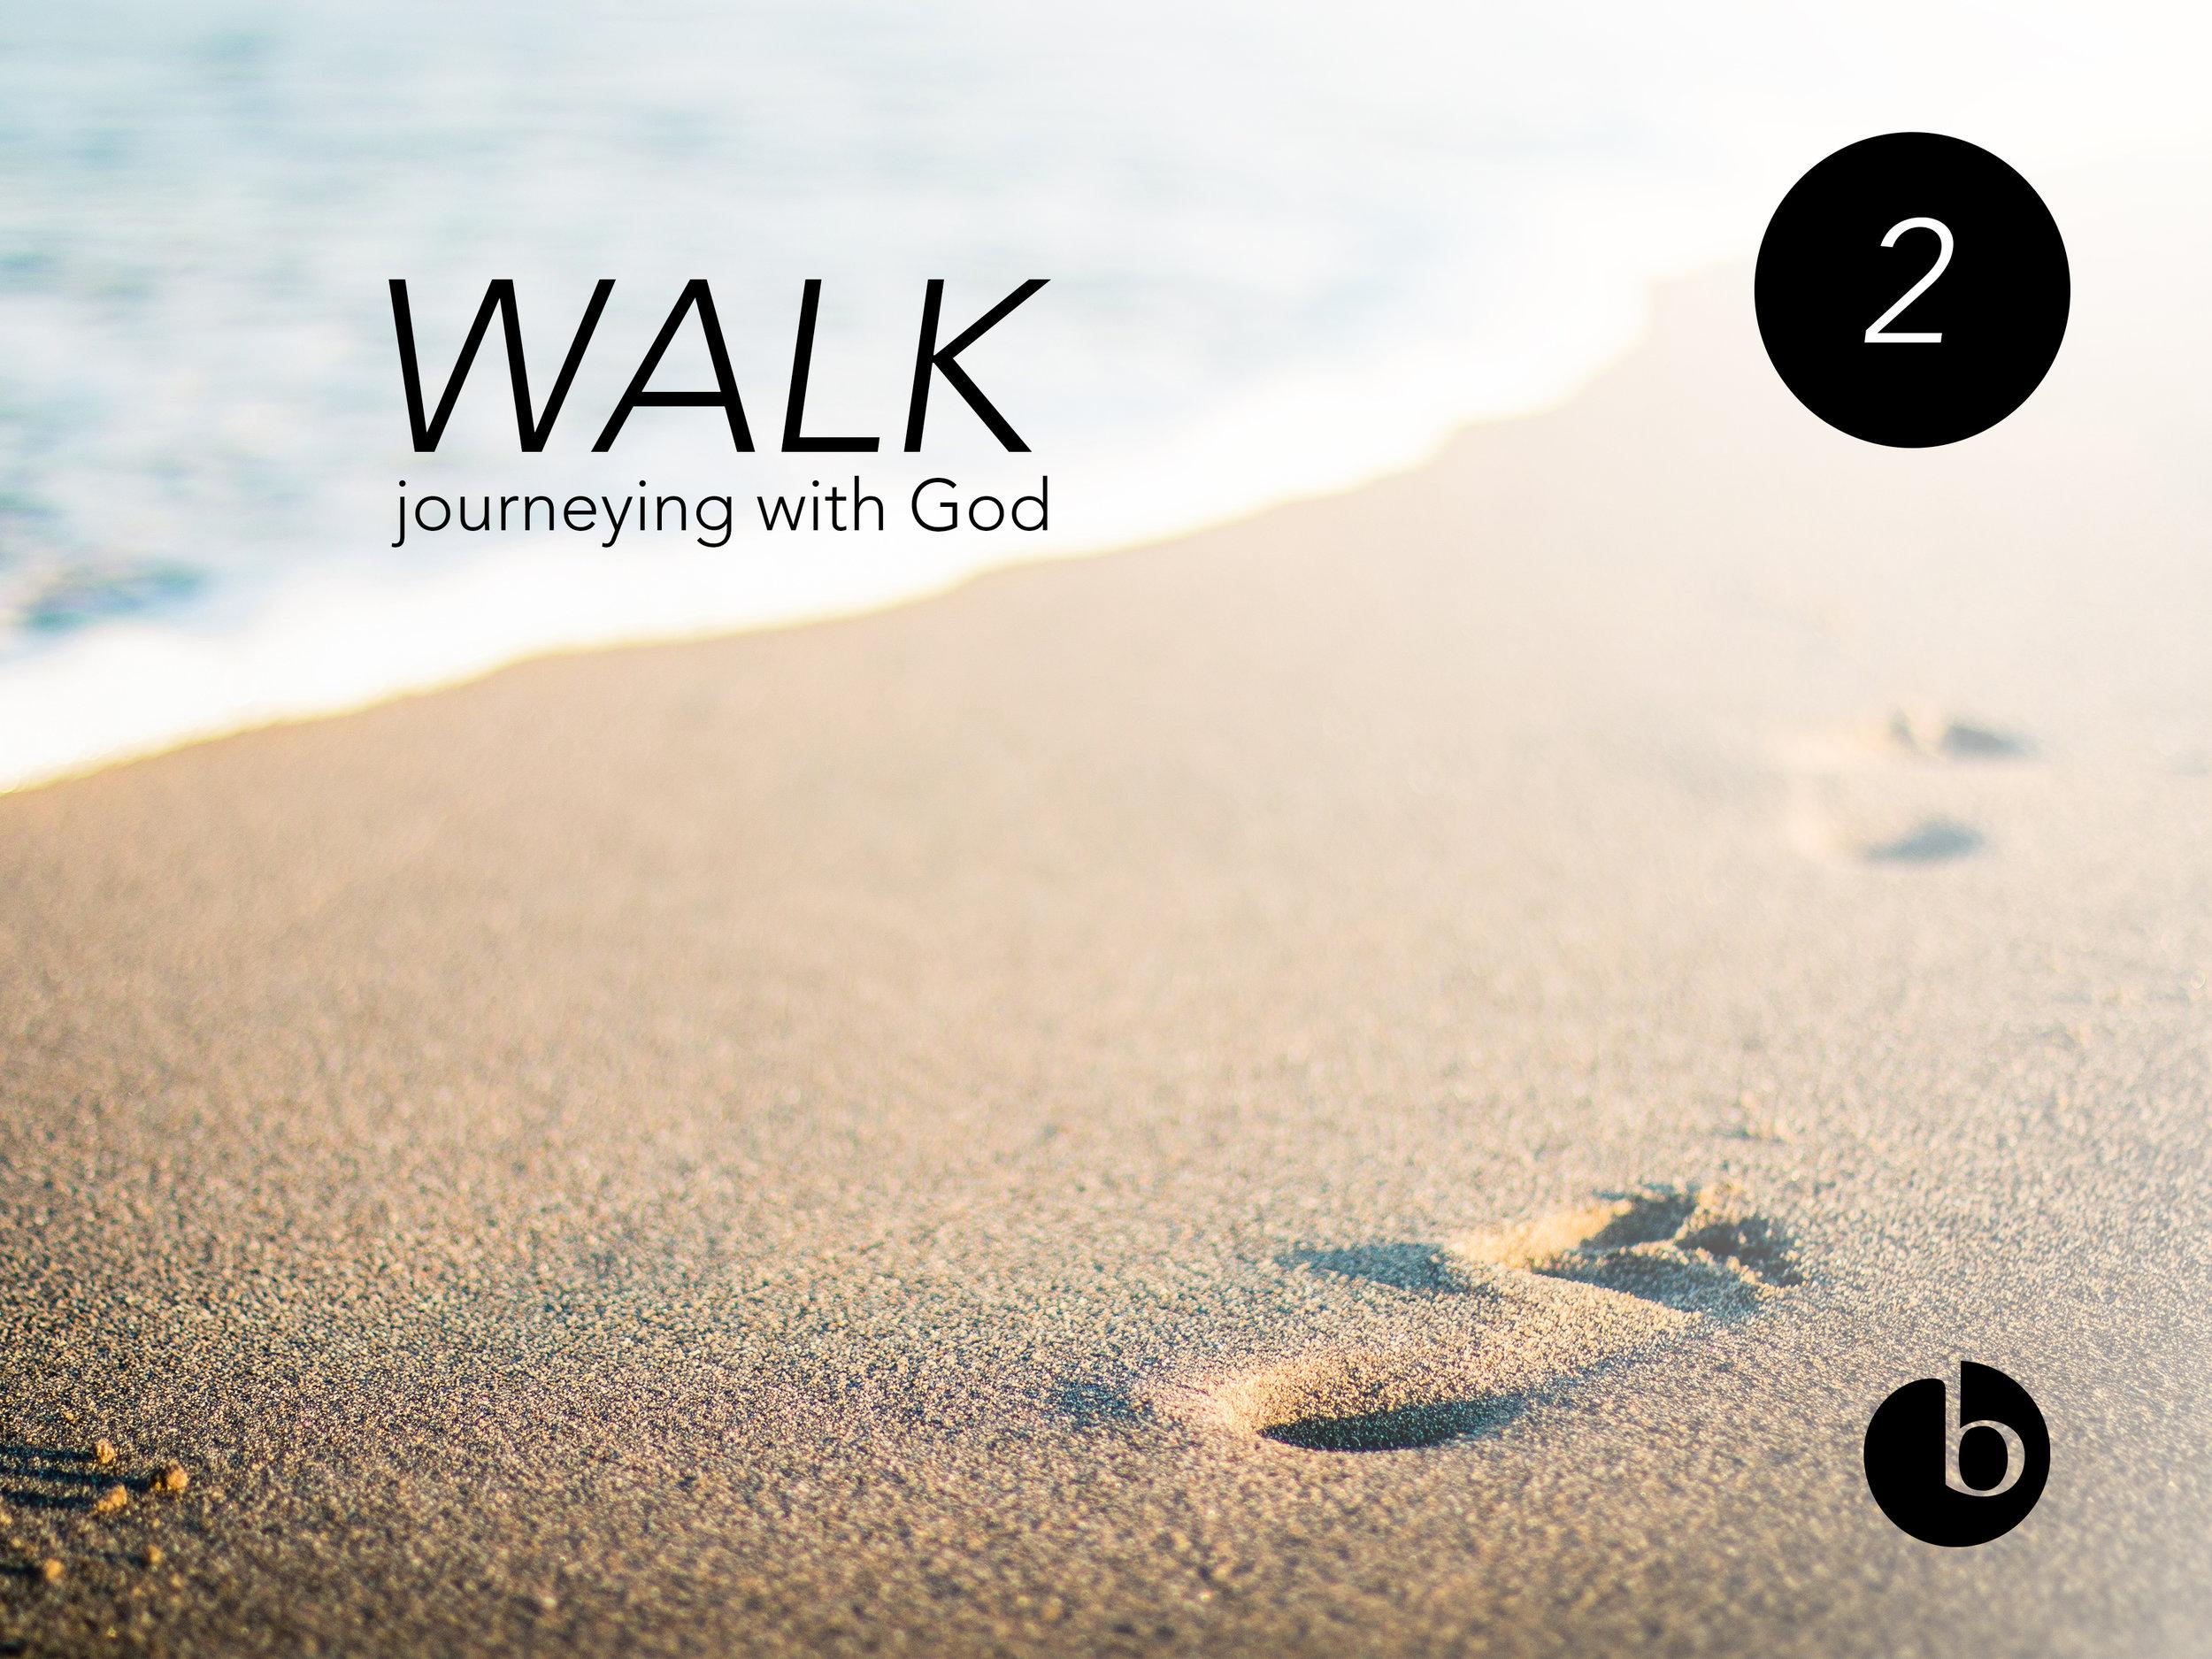 Walk Thumbnail 2.jpg